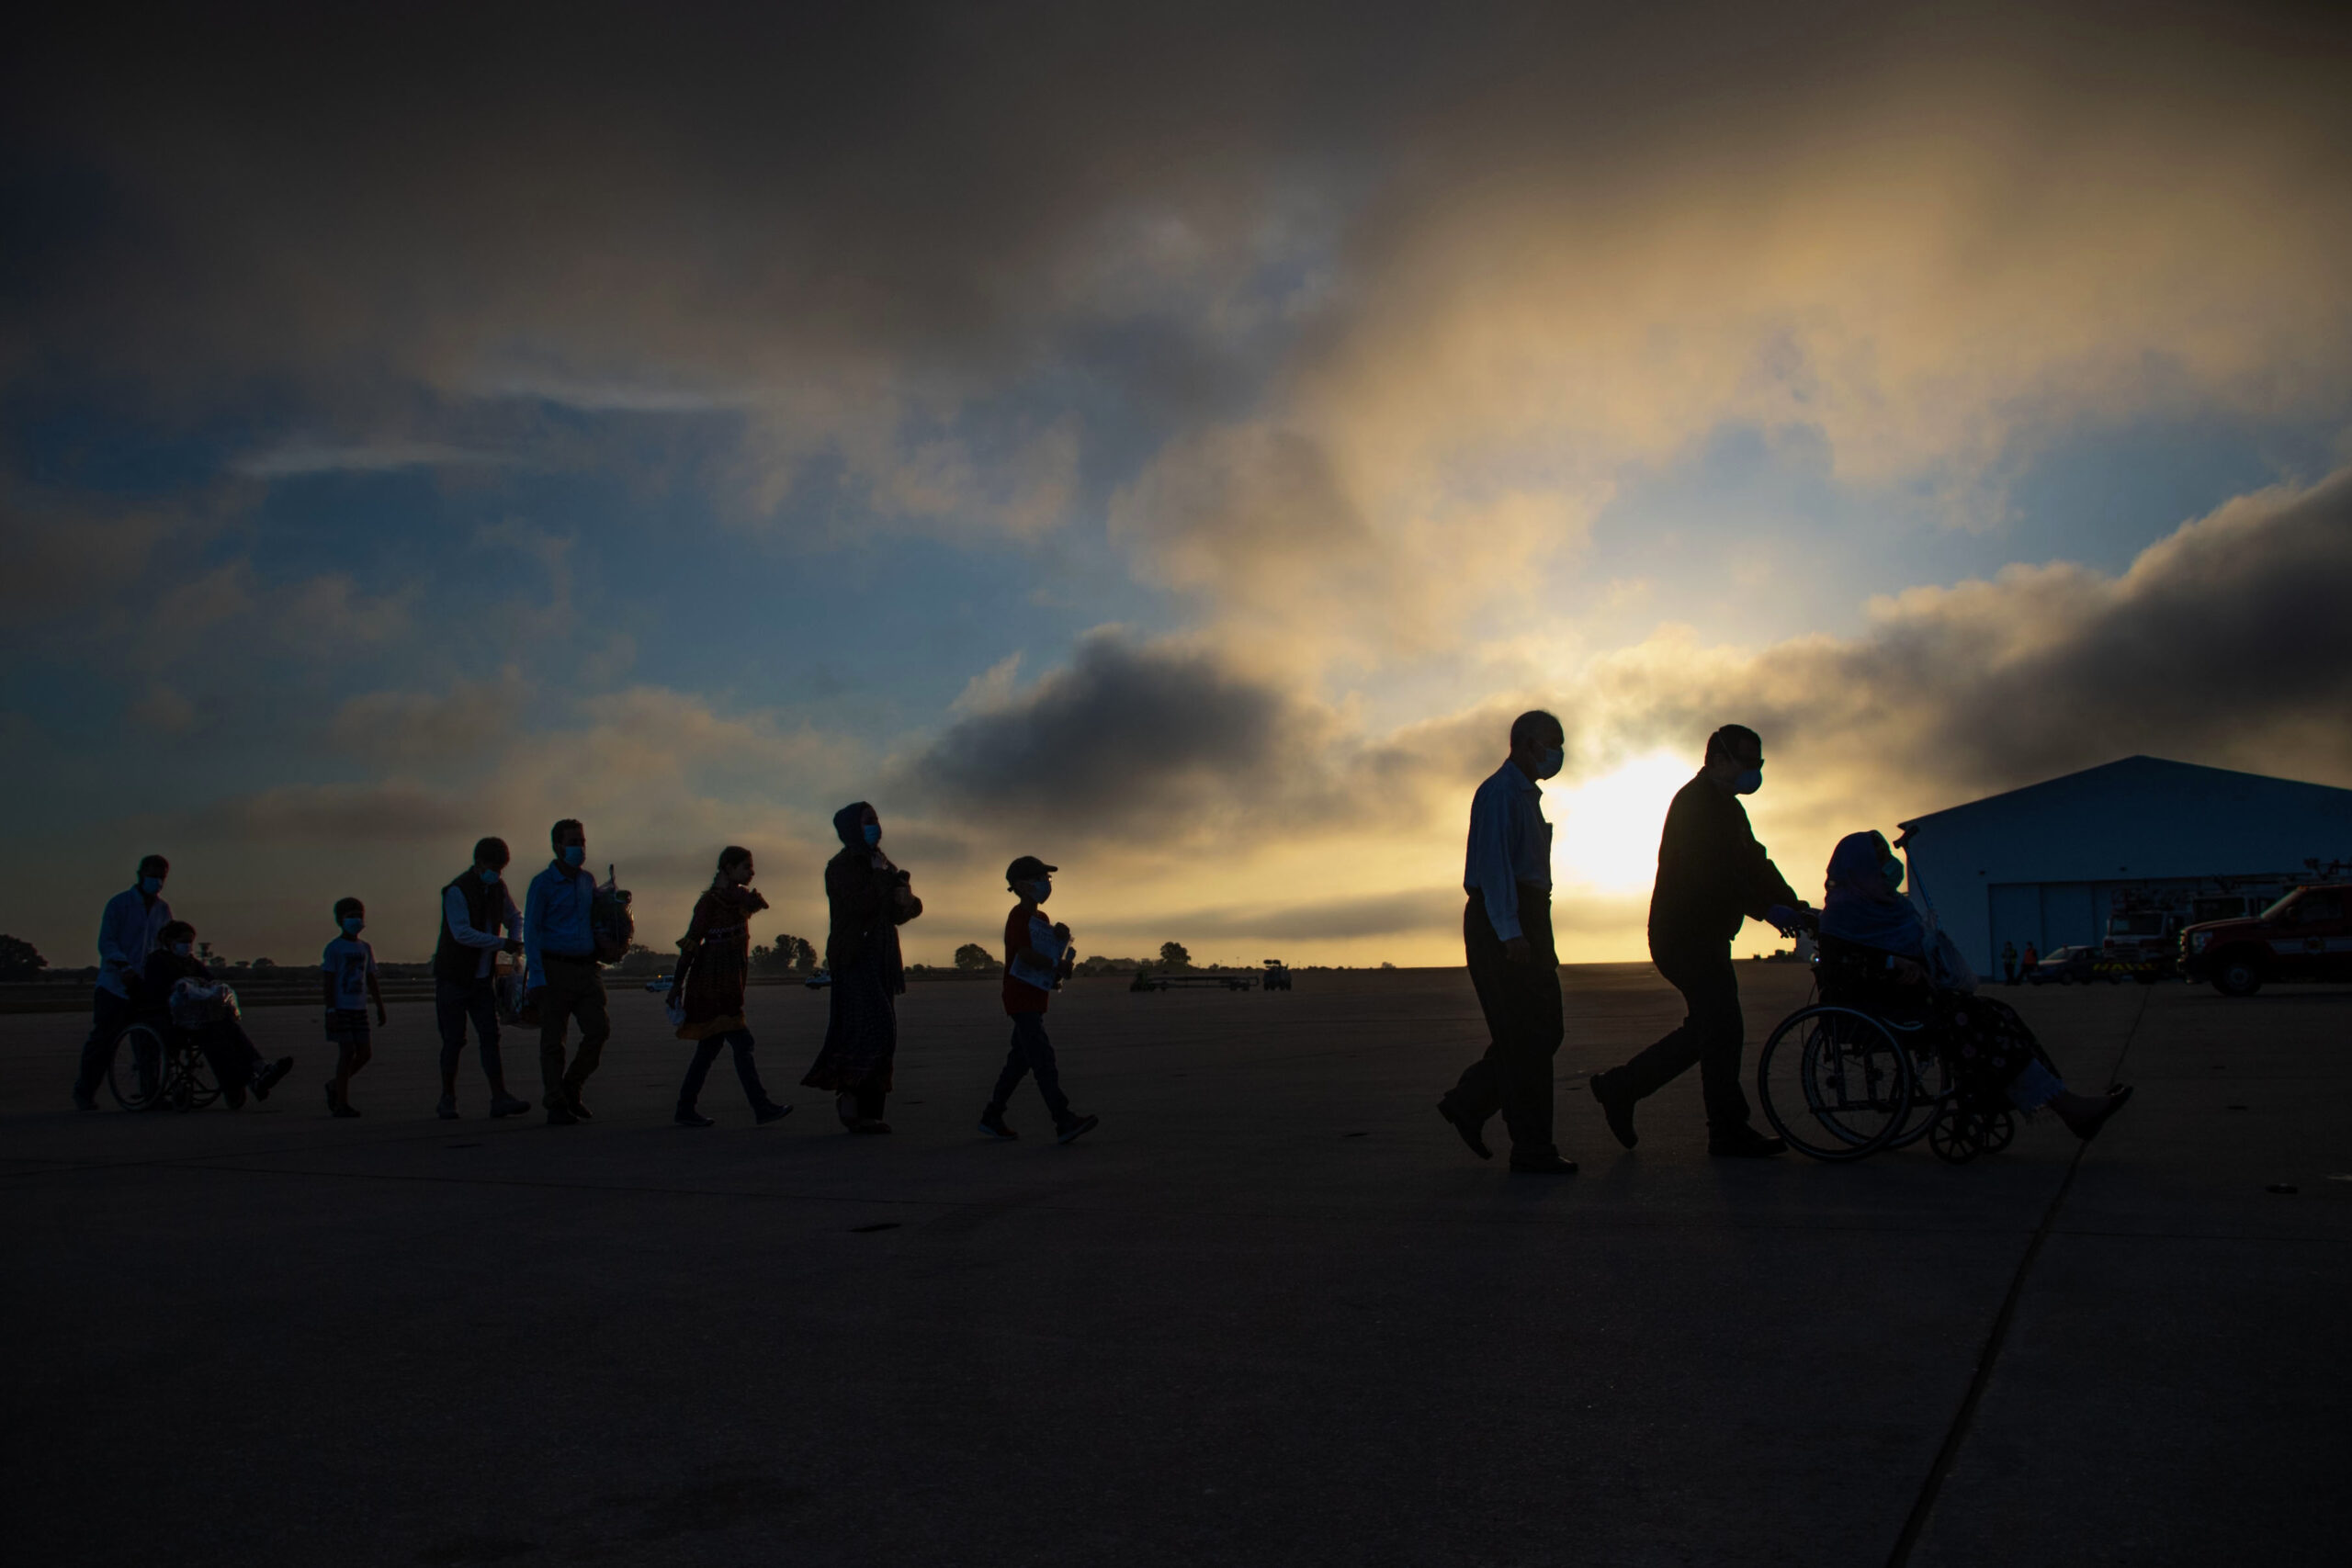 Evacuees boarding military plane at night